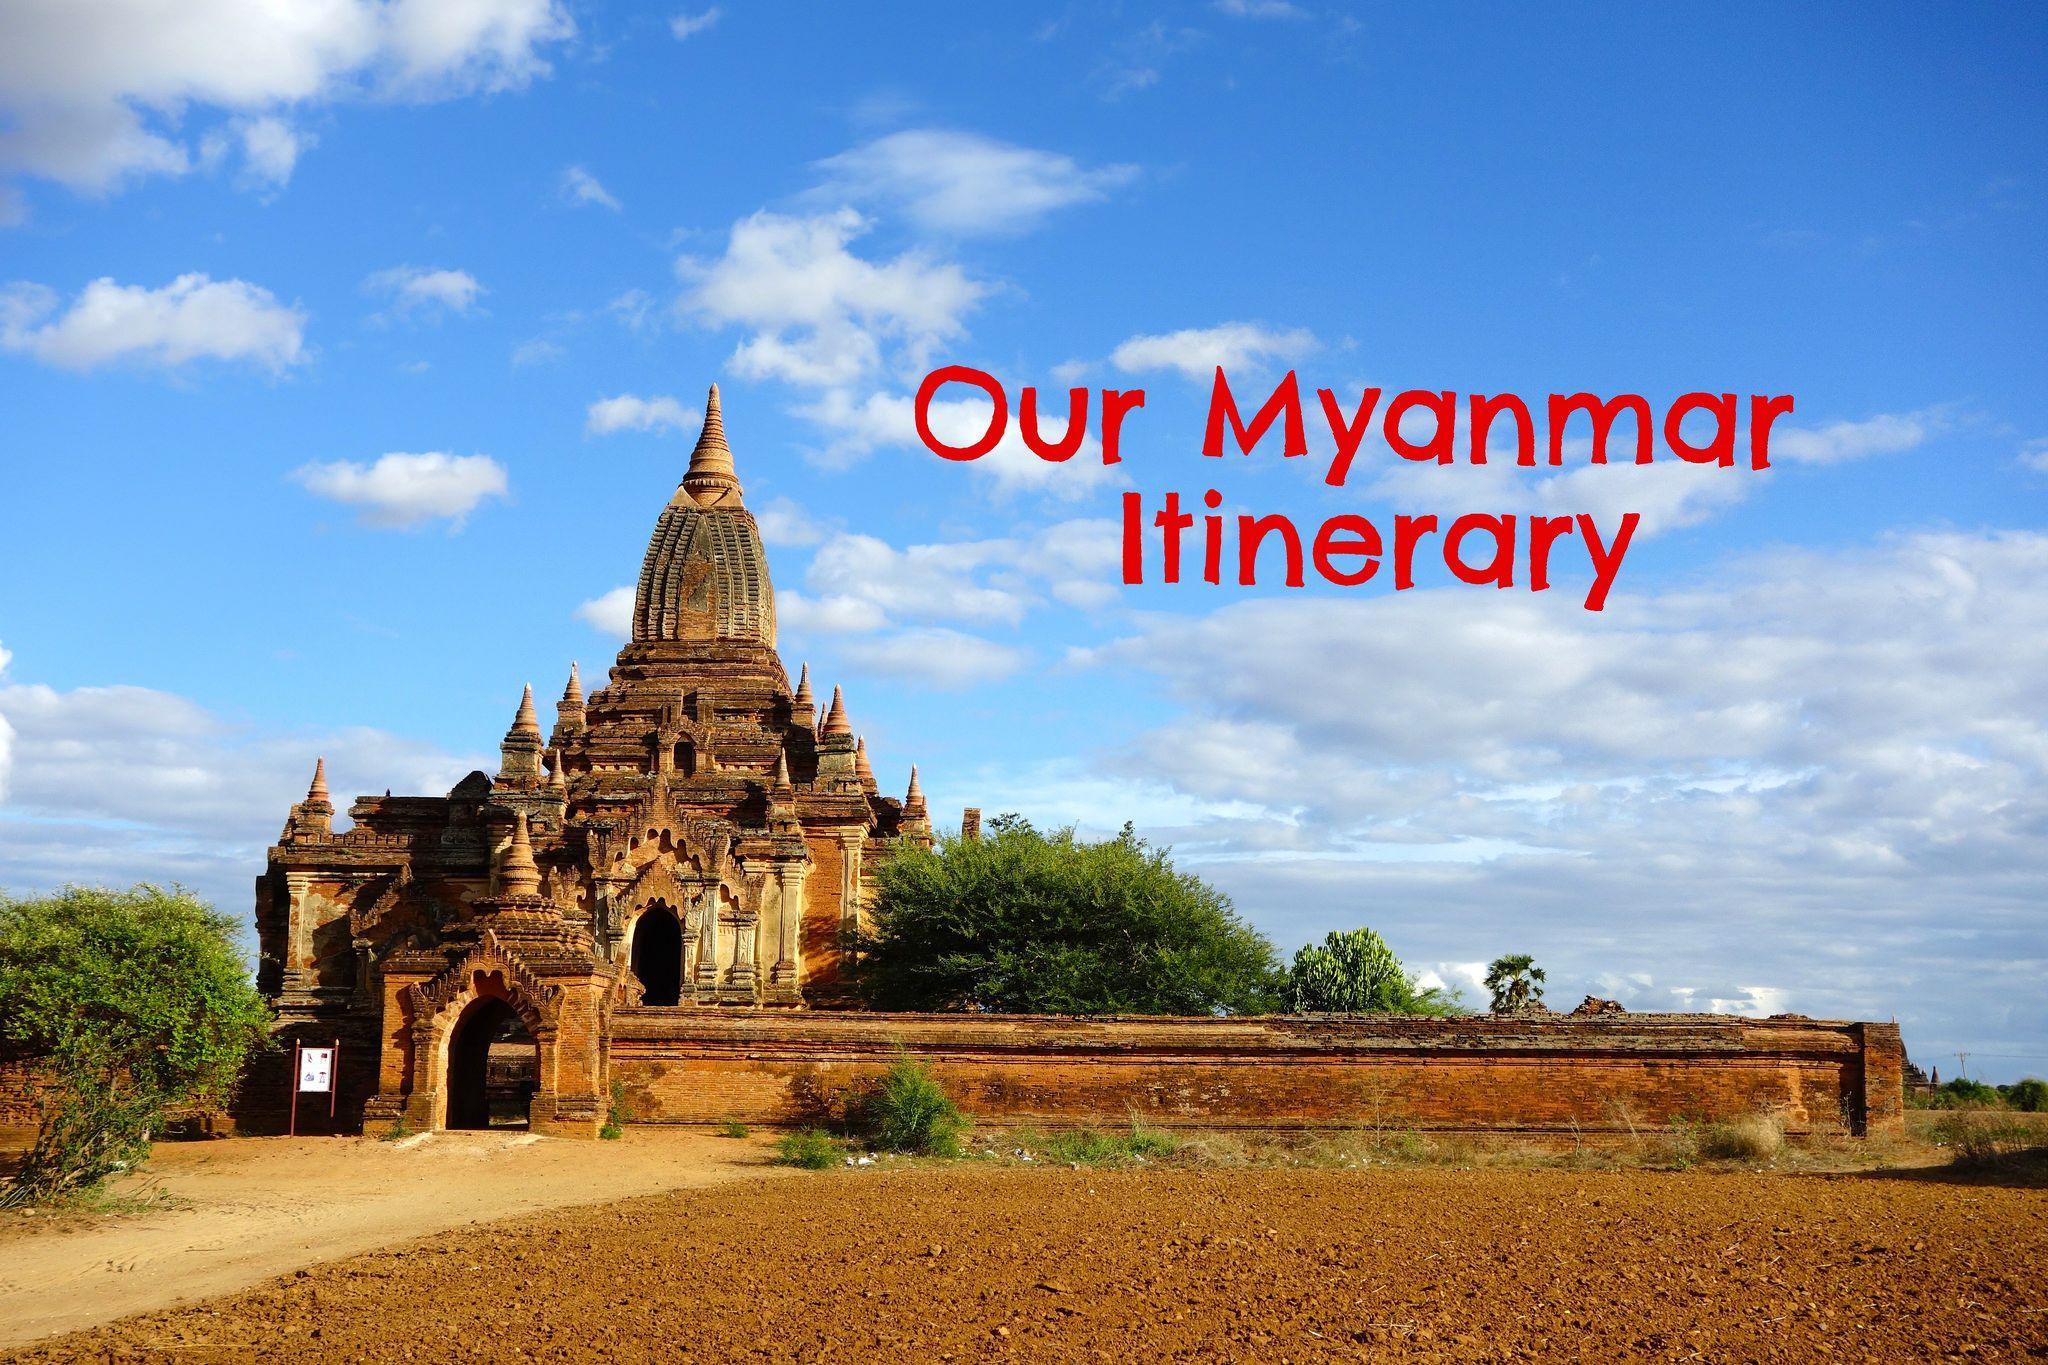 Our Myanmar itinerary with detailed travel tips per destination: Mandalay, Monywa, Bagan, Kalaw, Inle Lake and Yangon.